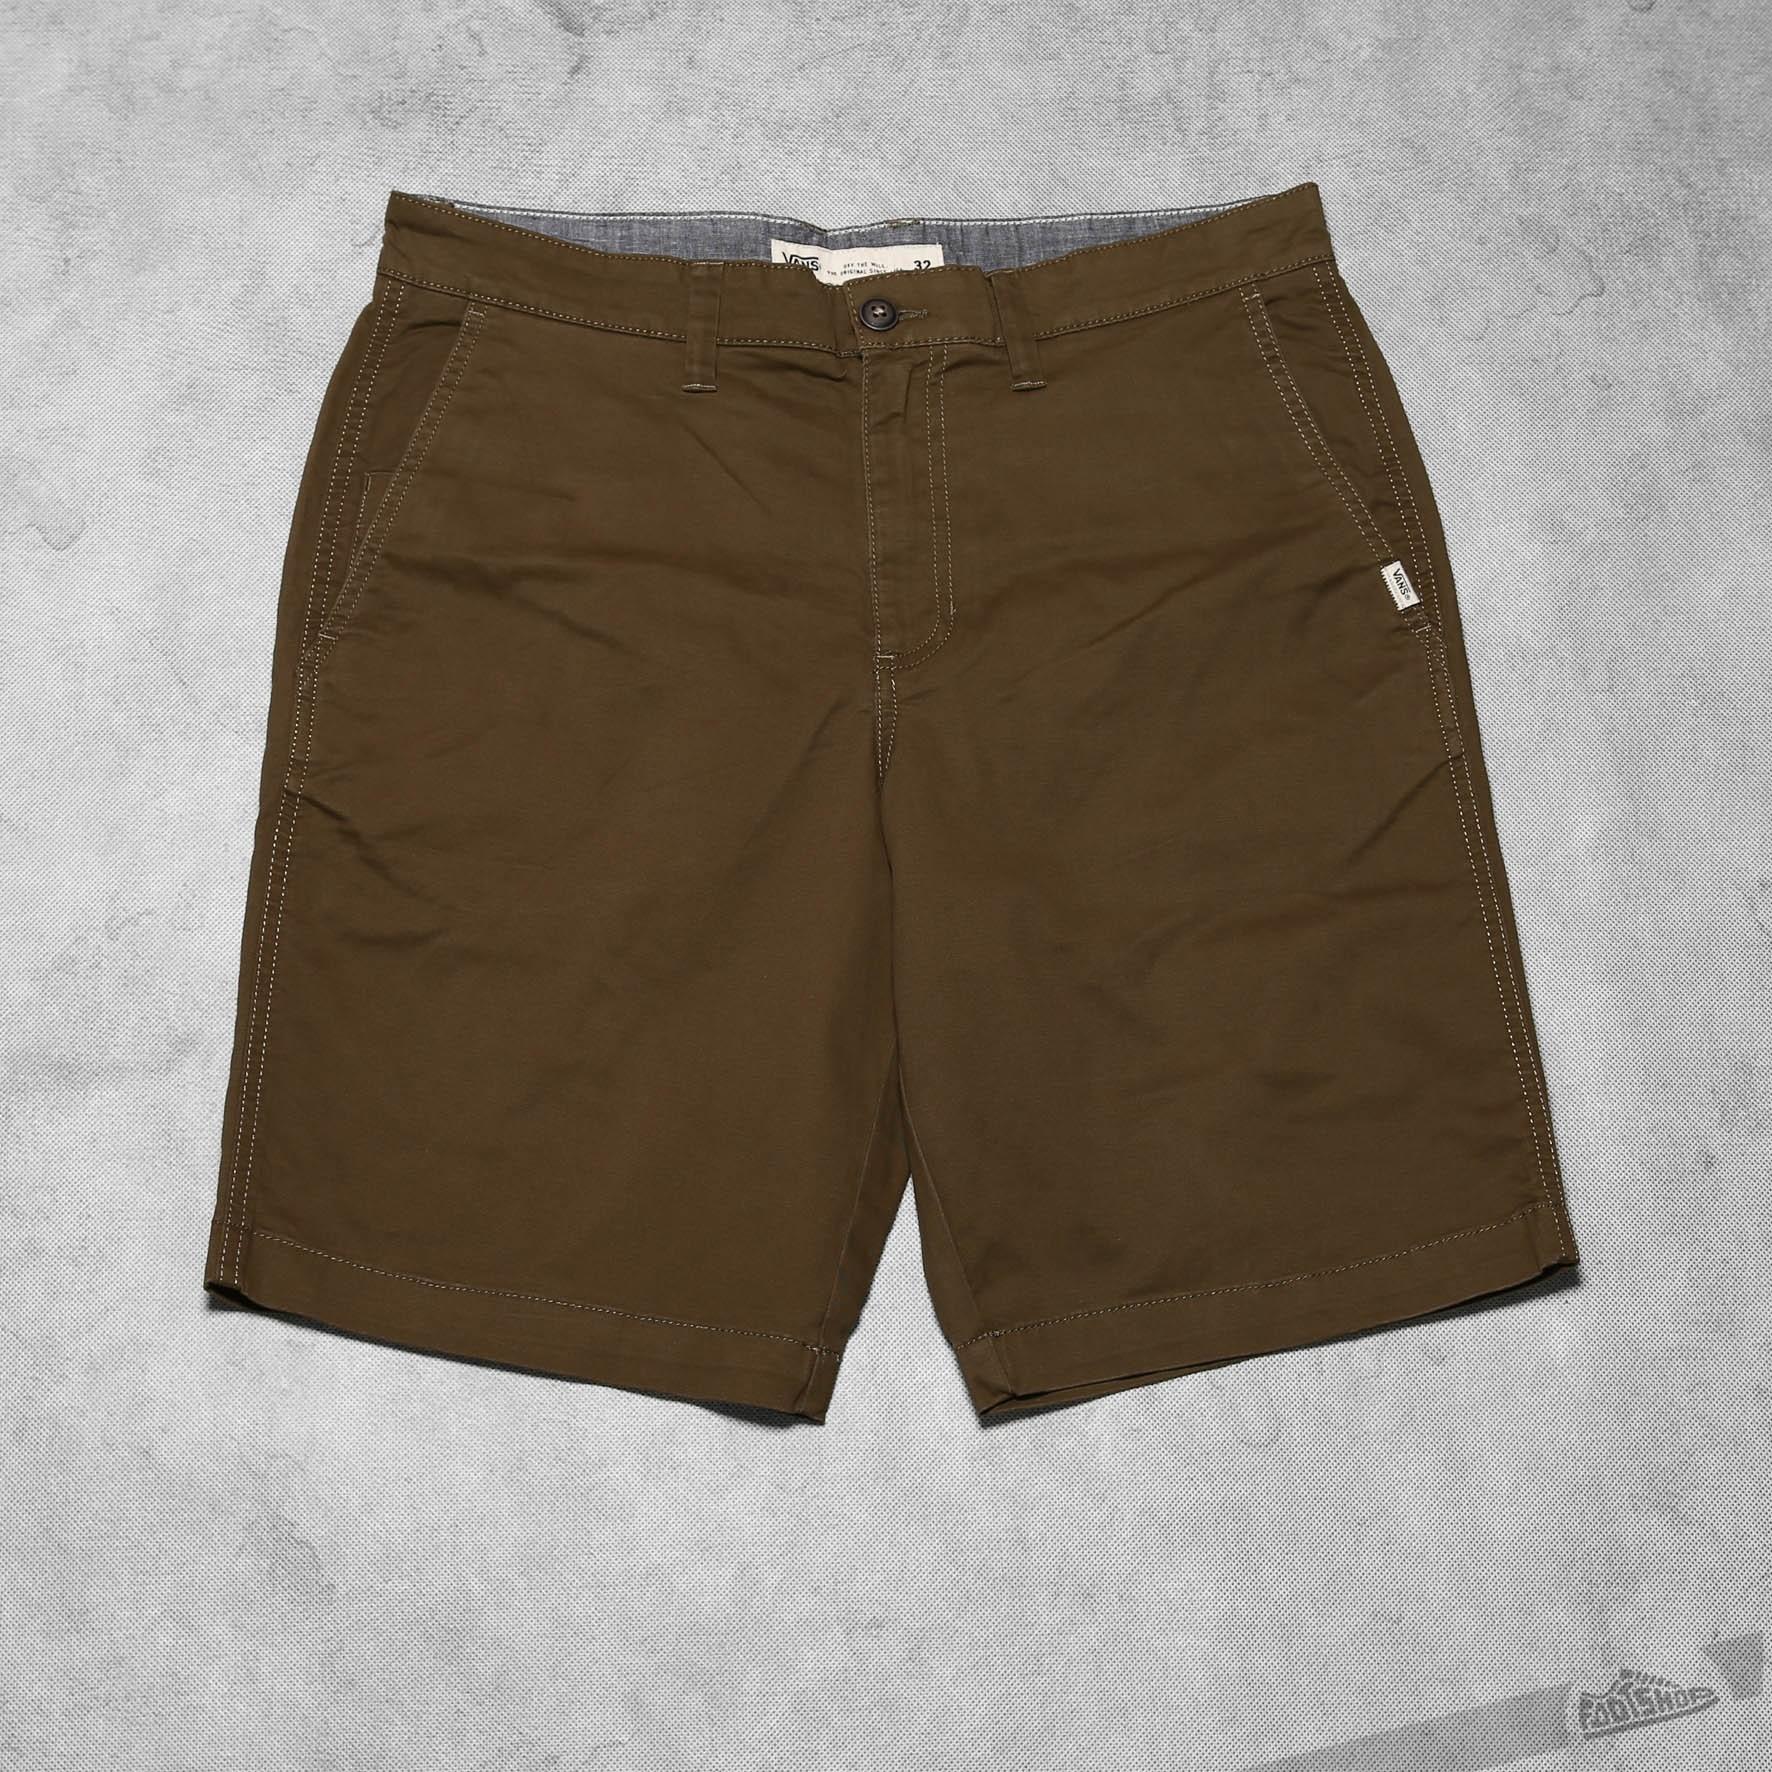 Vans Bedford Shorts Guacamole